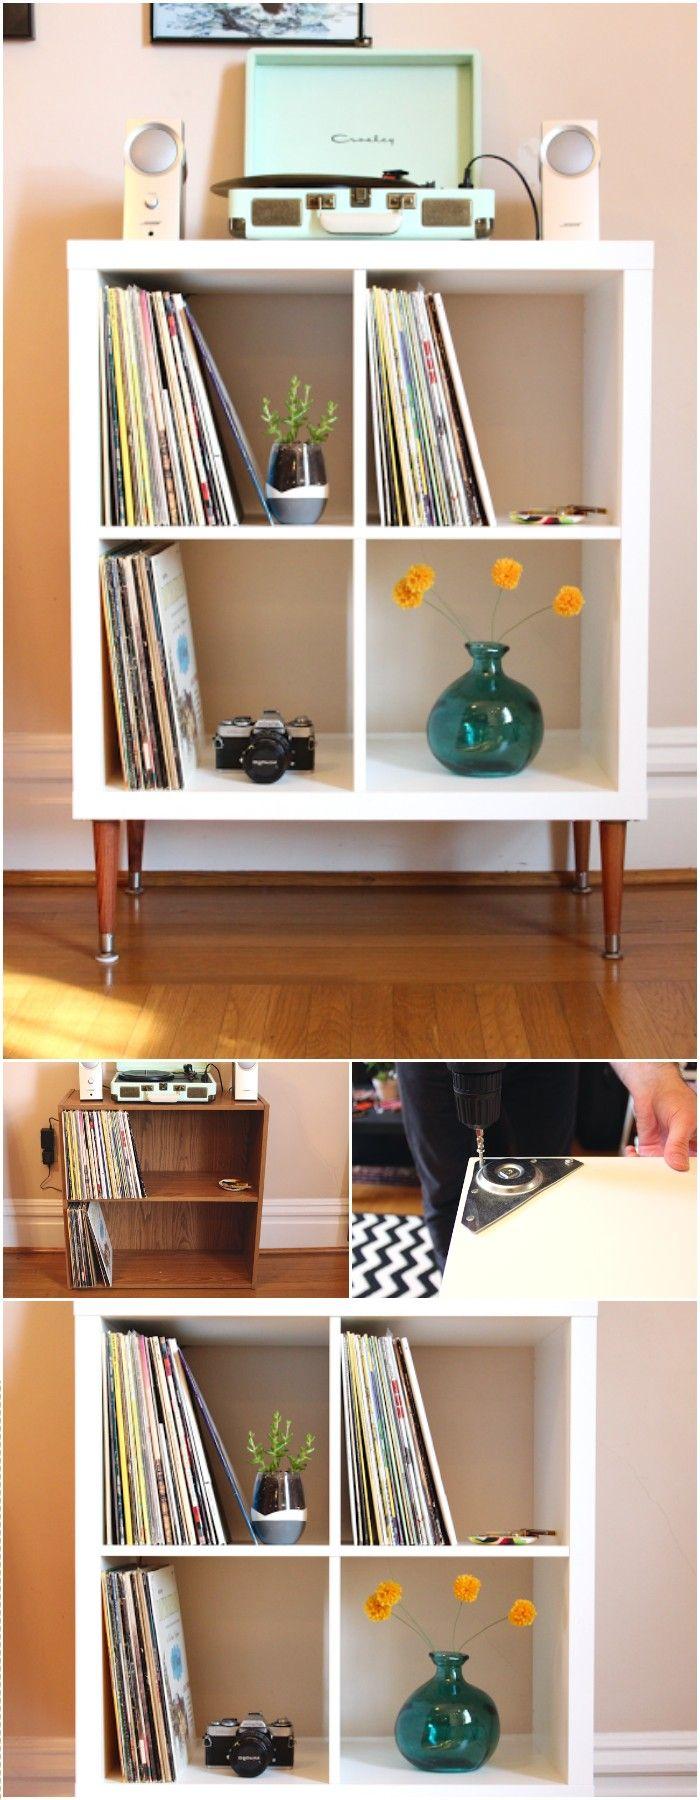 41+ Ikea home decor items ideas in 2021